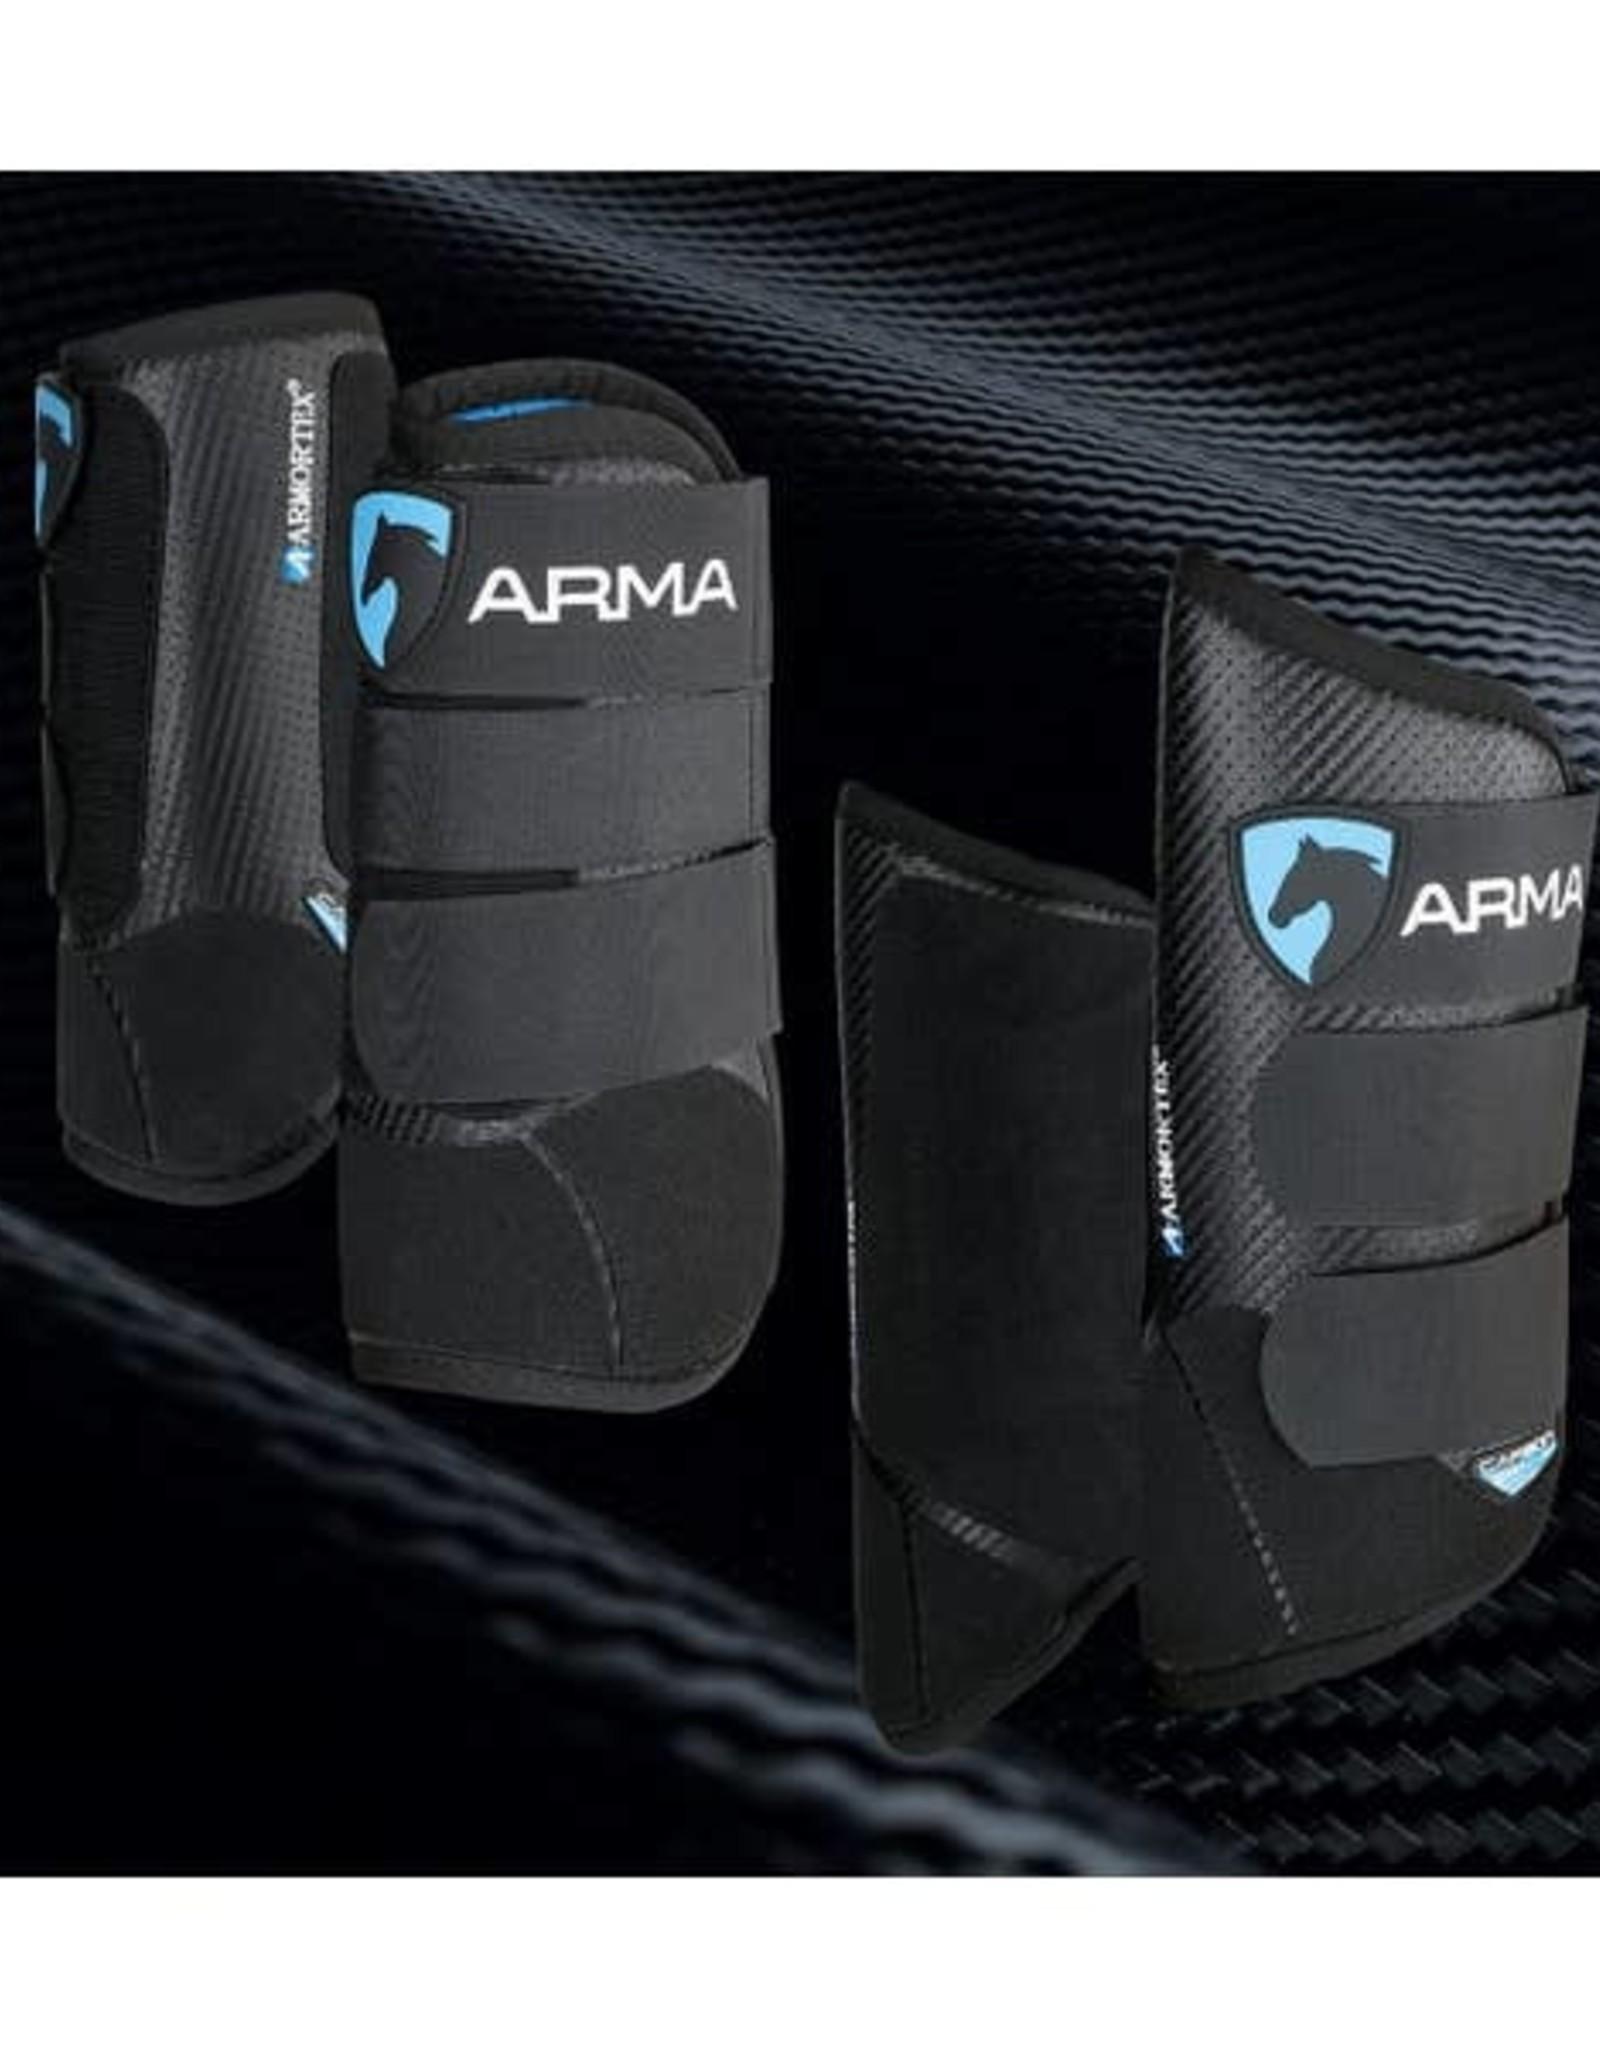 ARMA ARMA CARBON XC REAR BOOTS